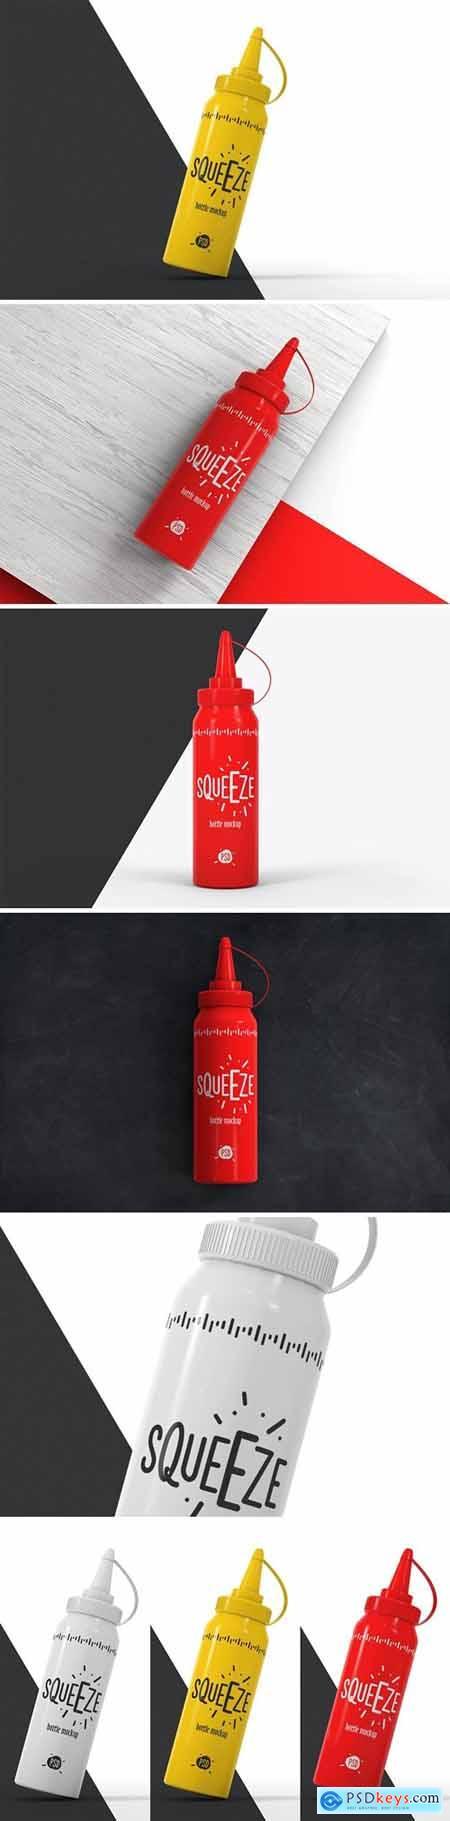 Squeeze Bottle Mockup